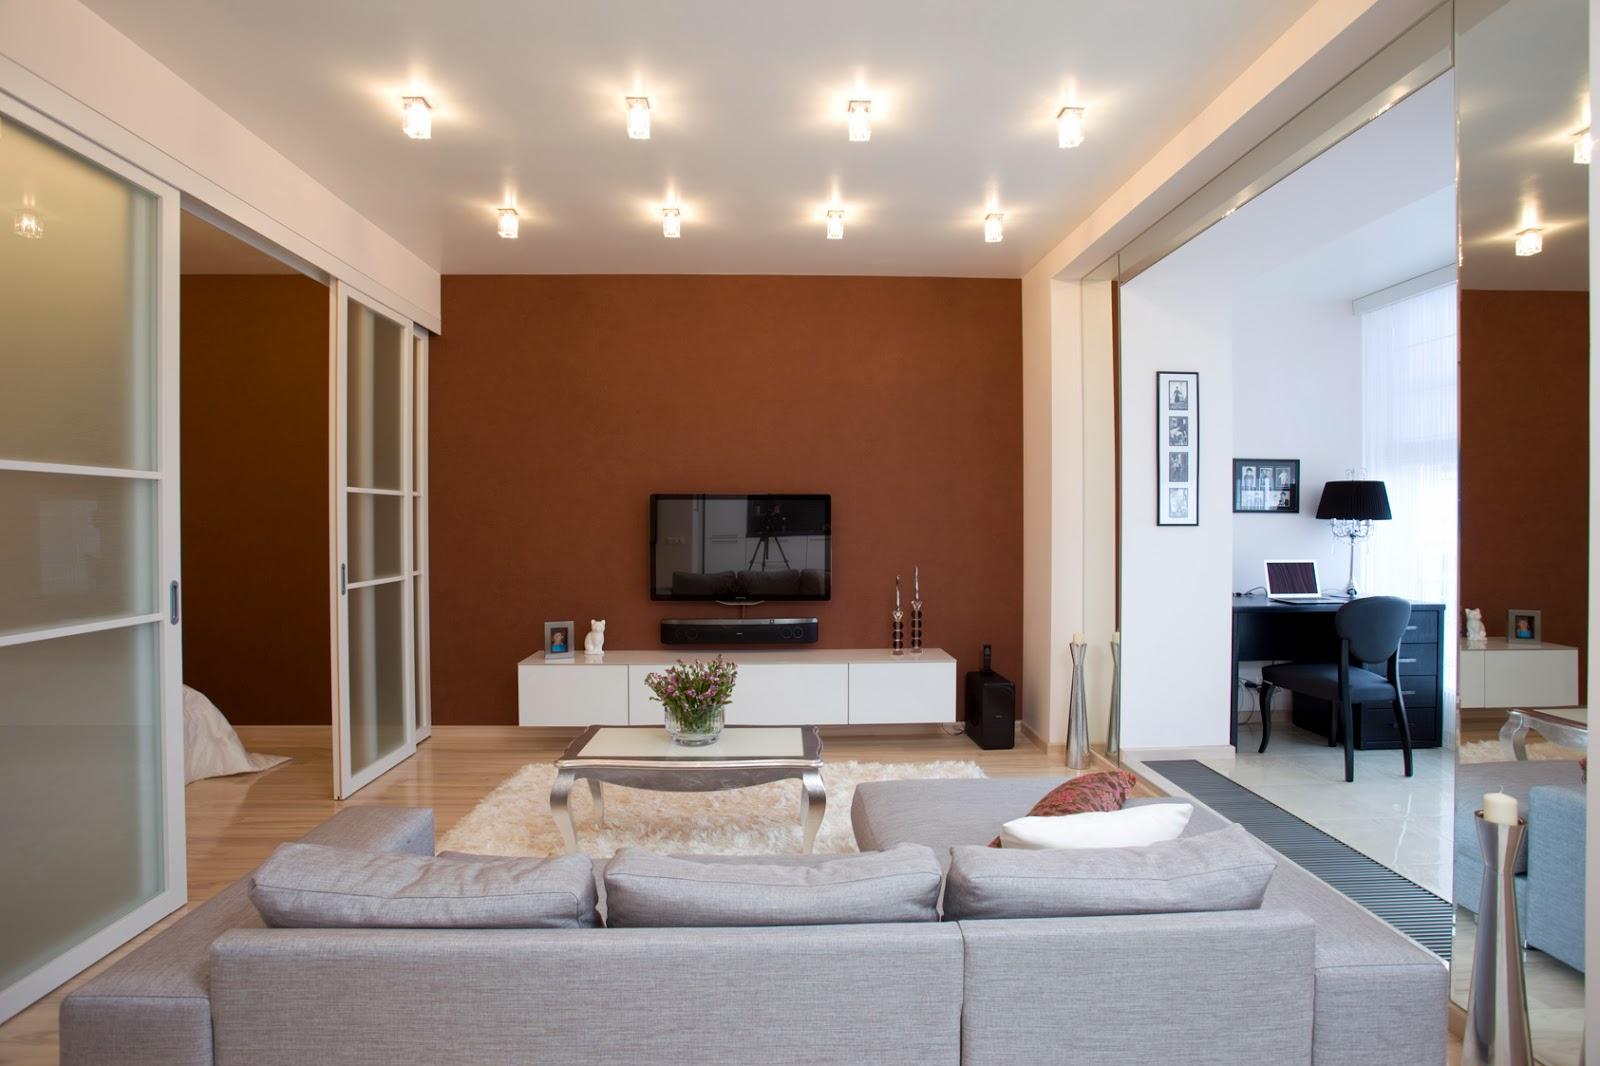 Ремонт двухкомнатной квартиры в Нижнекамске под ключ